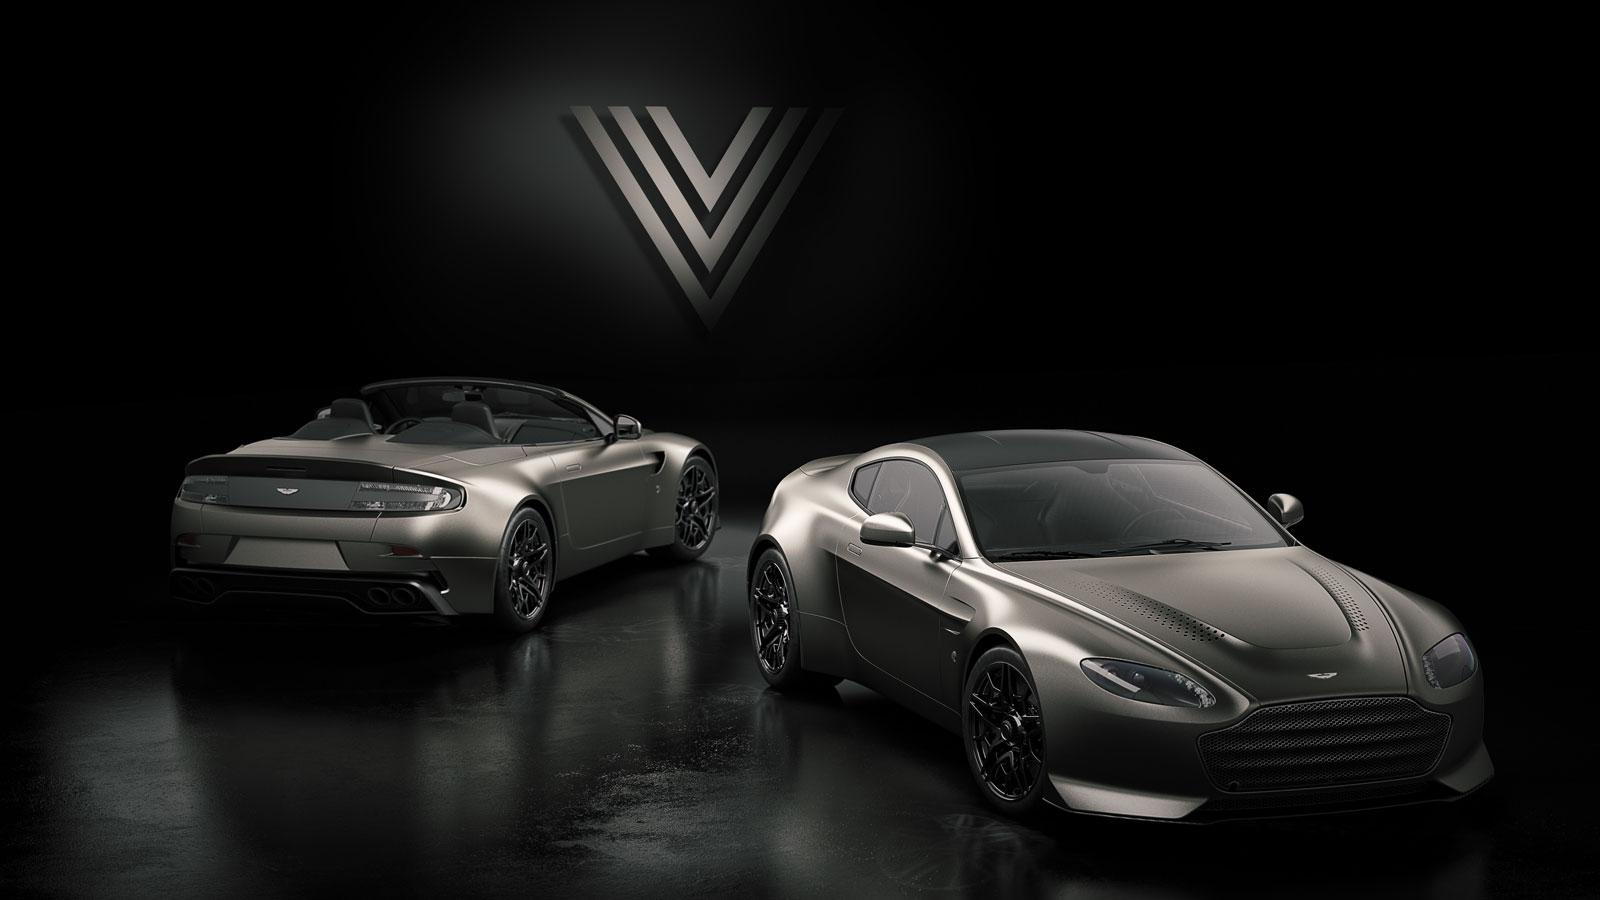 Aston Martin Vantage V600 Car Body Design